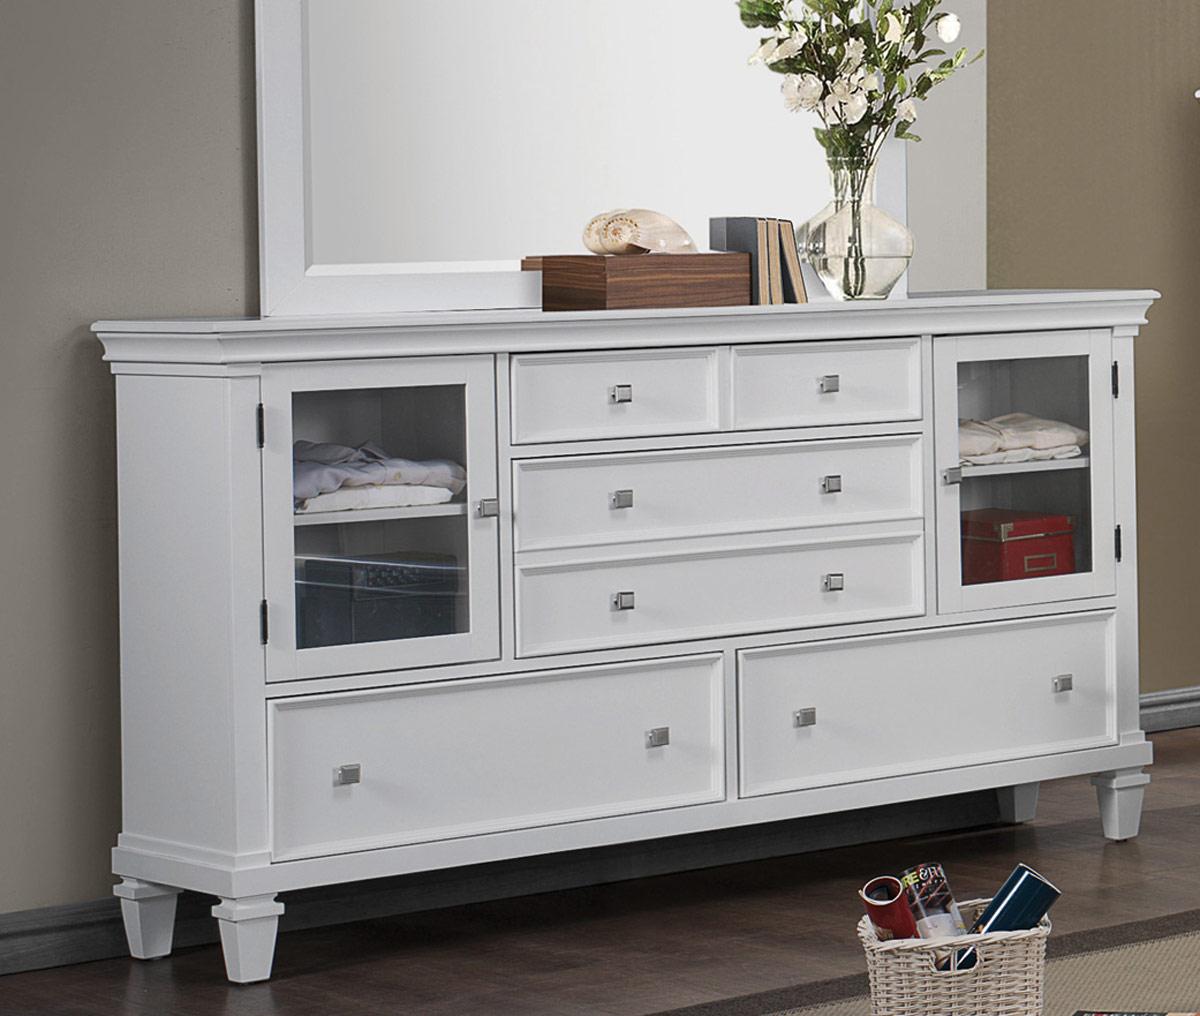 Coaster Camellia Dresser - White